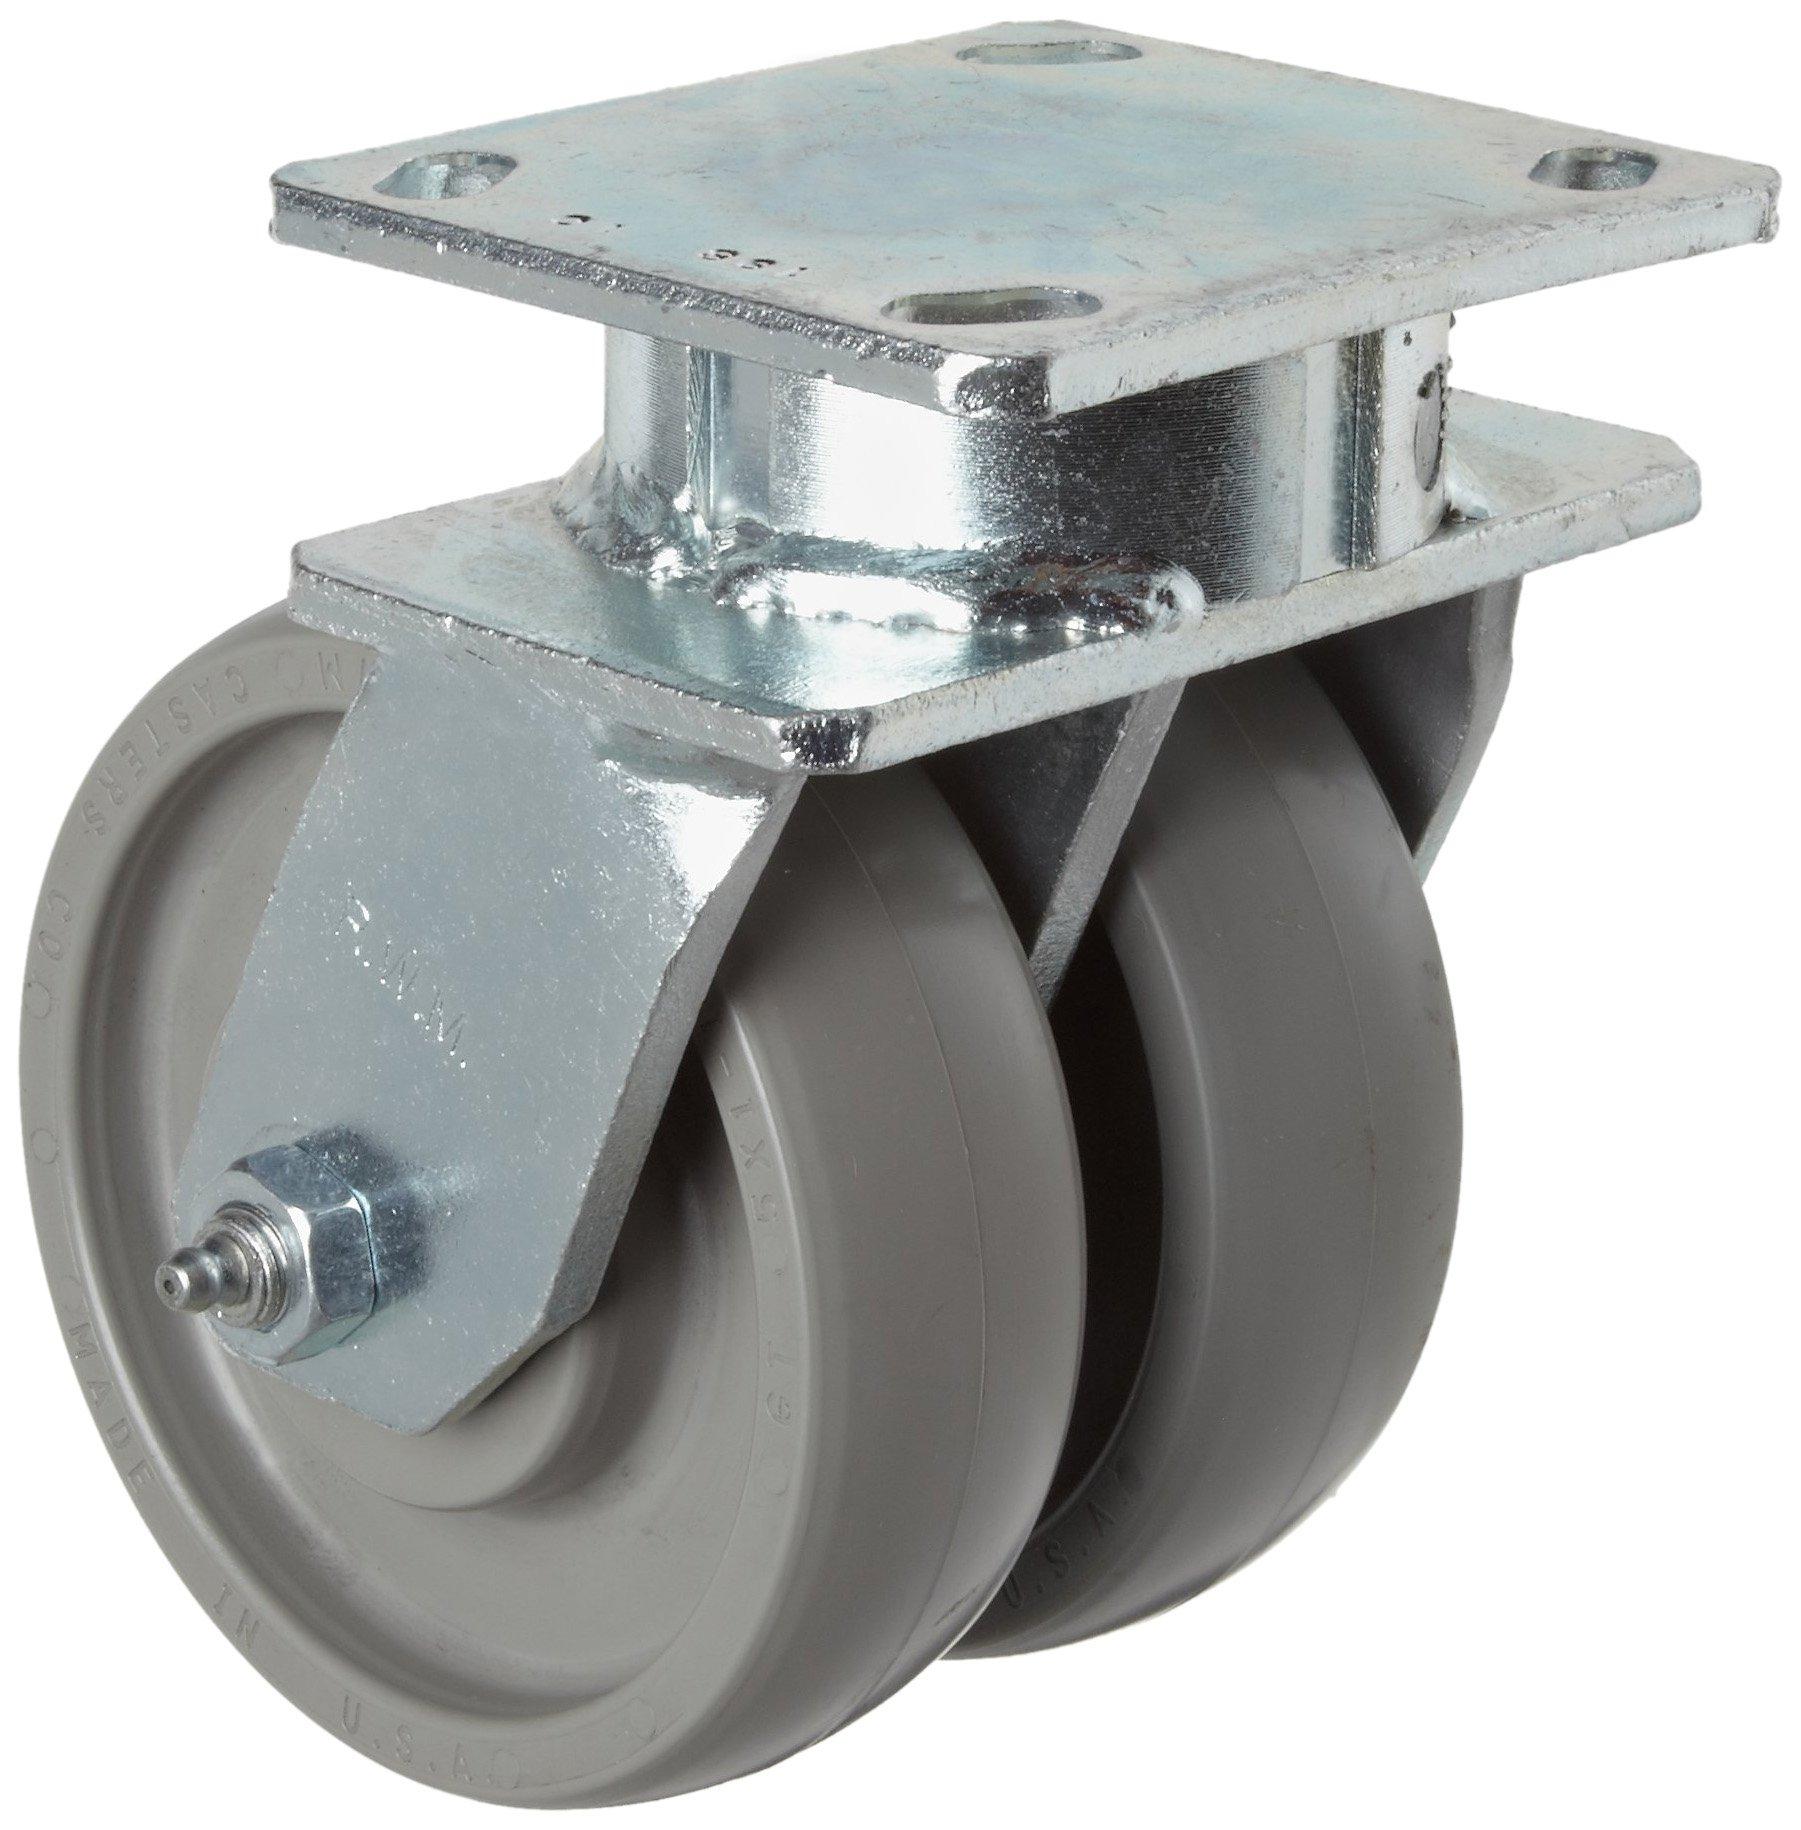 RWM Casters 2-75 Series Plate Caster, Swivel, Dual Wheel, Kingpinless, Rubber on Aluminum Wheel, Ball Bearing, 1600 lbs Capacity, 5'' Wheel Dia, 2'' Wheel Width, 7-1/2'' Mount Height, 6-1/2'' Plate Length, 4-1/2'' Plate Width